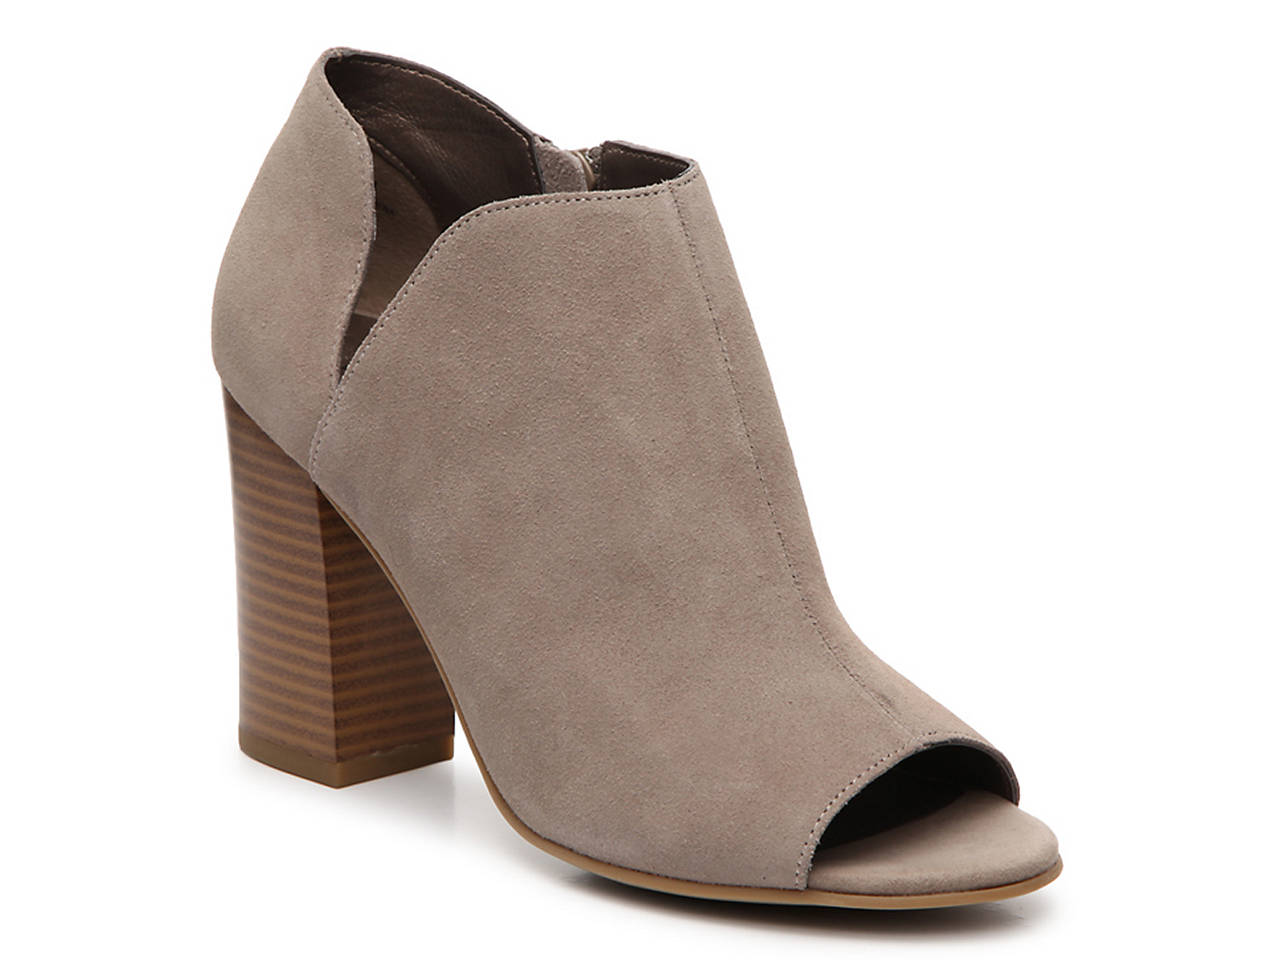 13c75bc6fea6 Moda Spana Ferman Bootie Women s Shoes